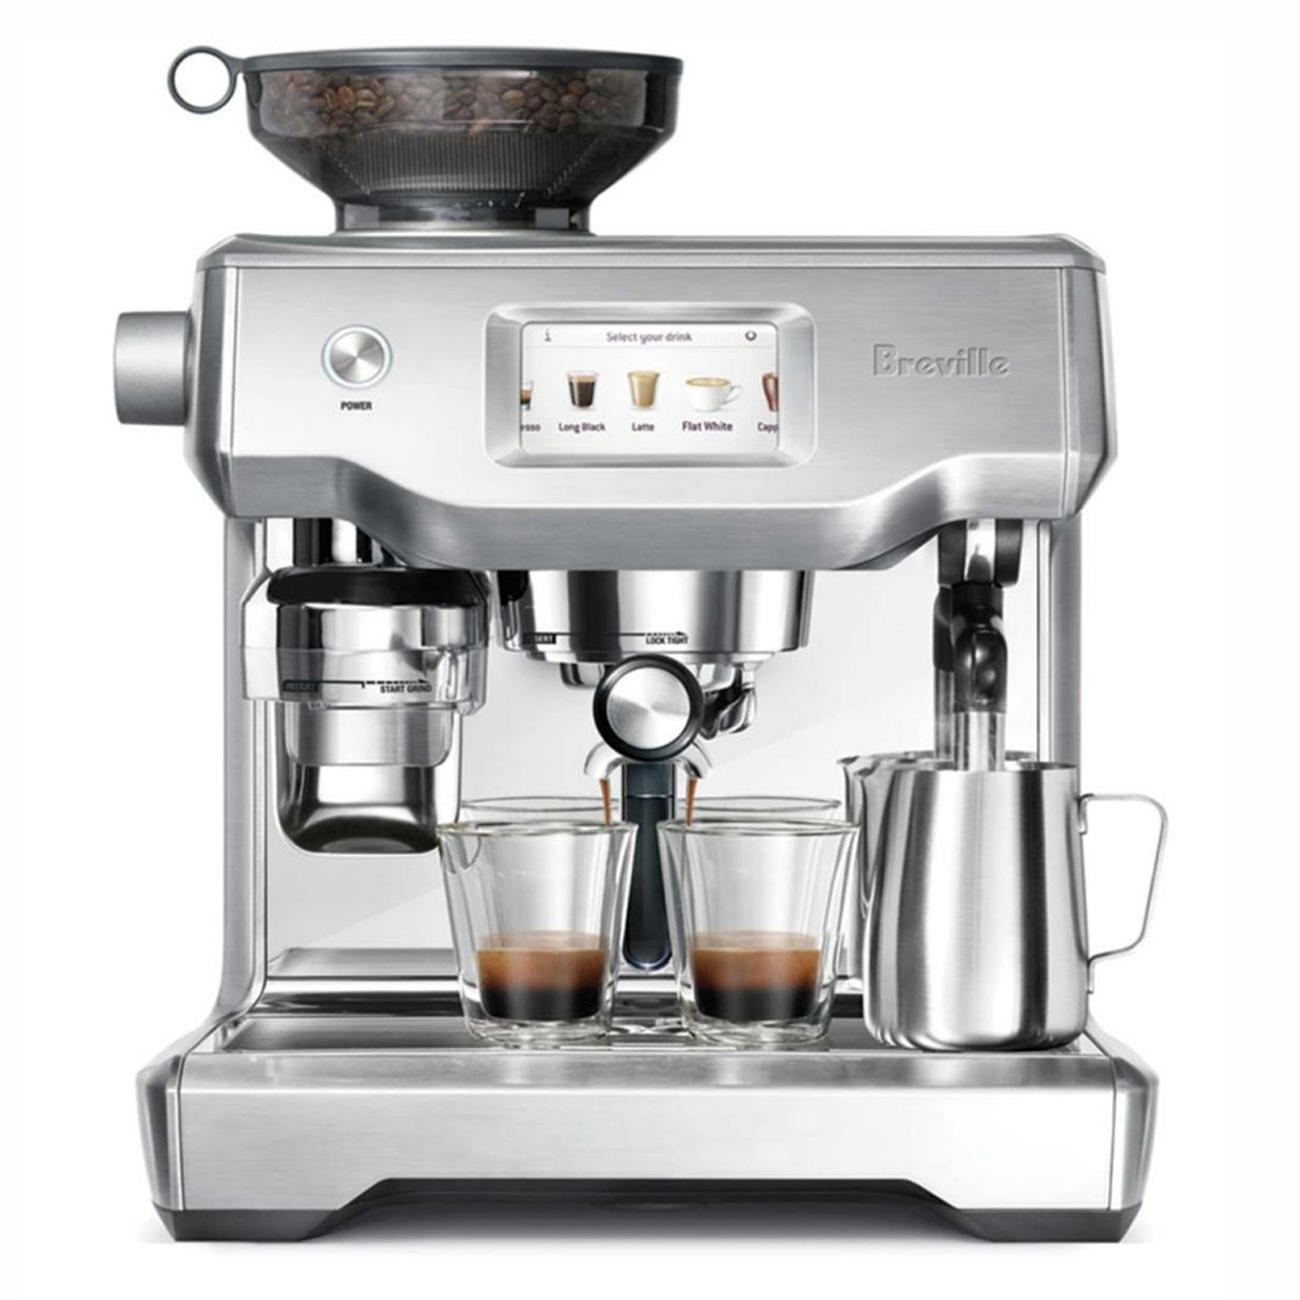 The Breville Oracle Touch Espresso Machine